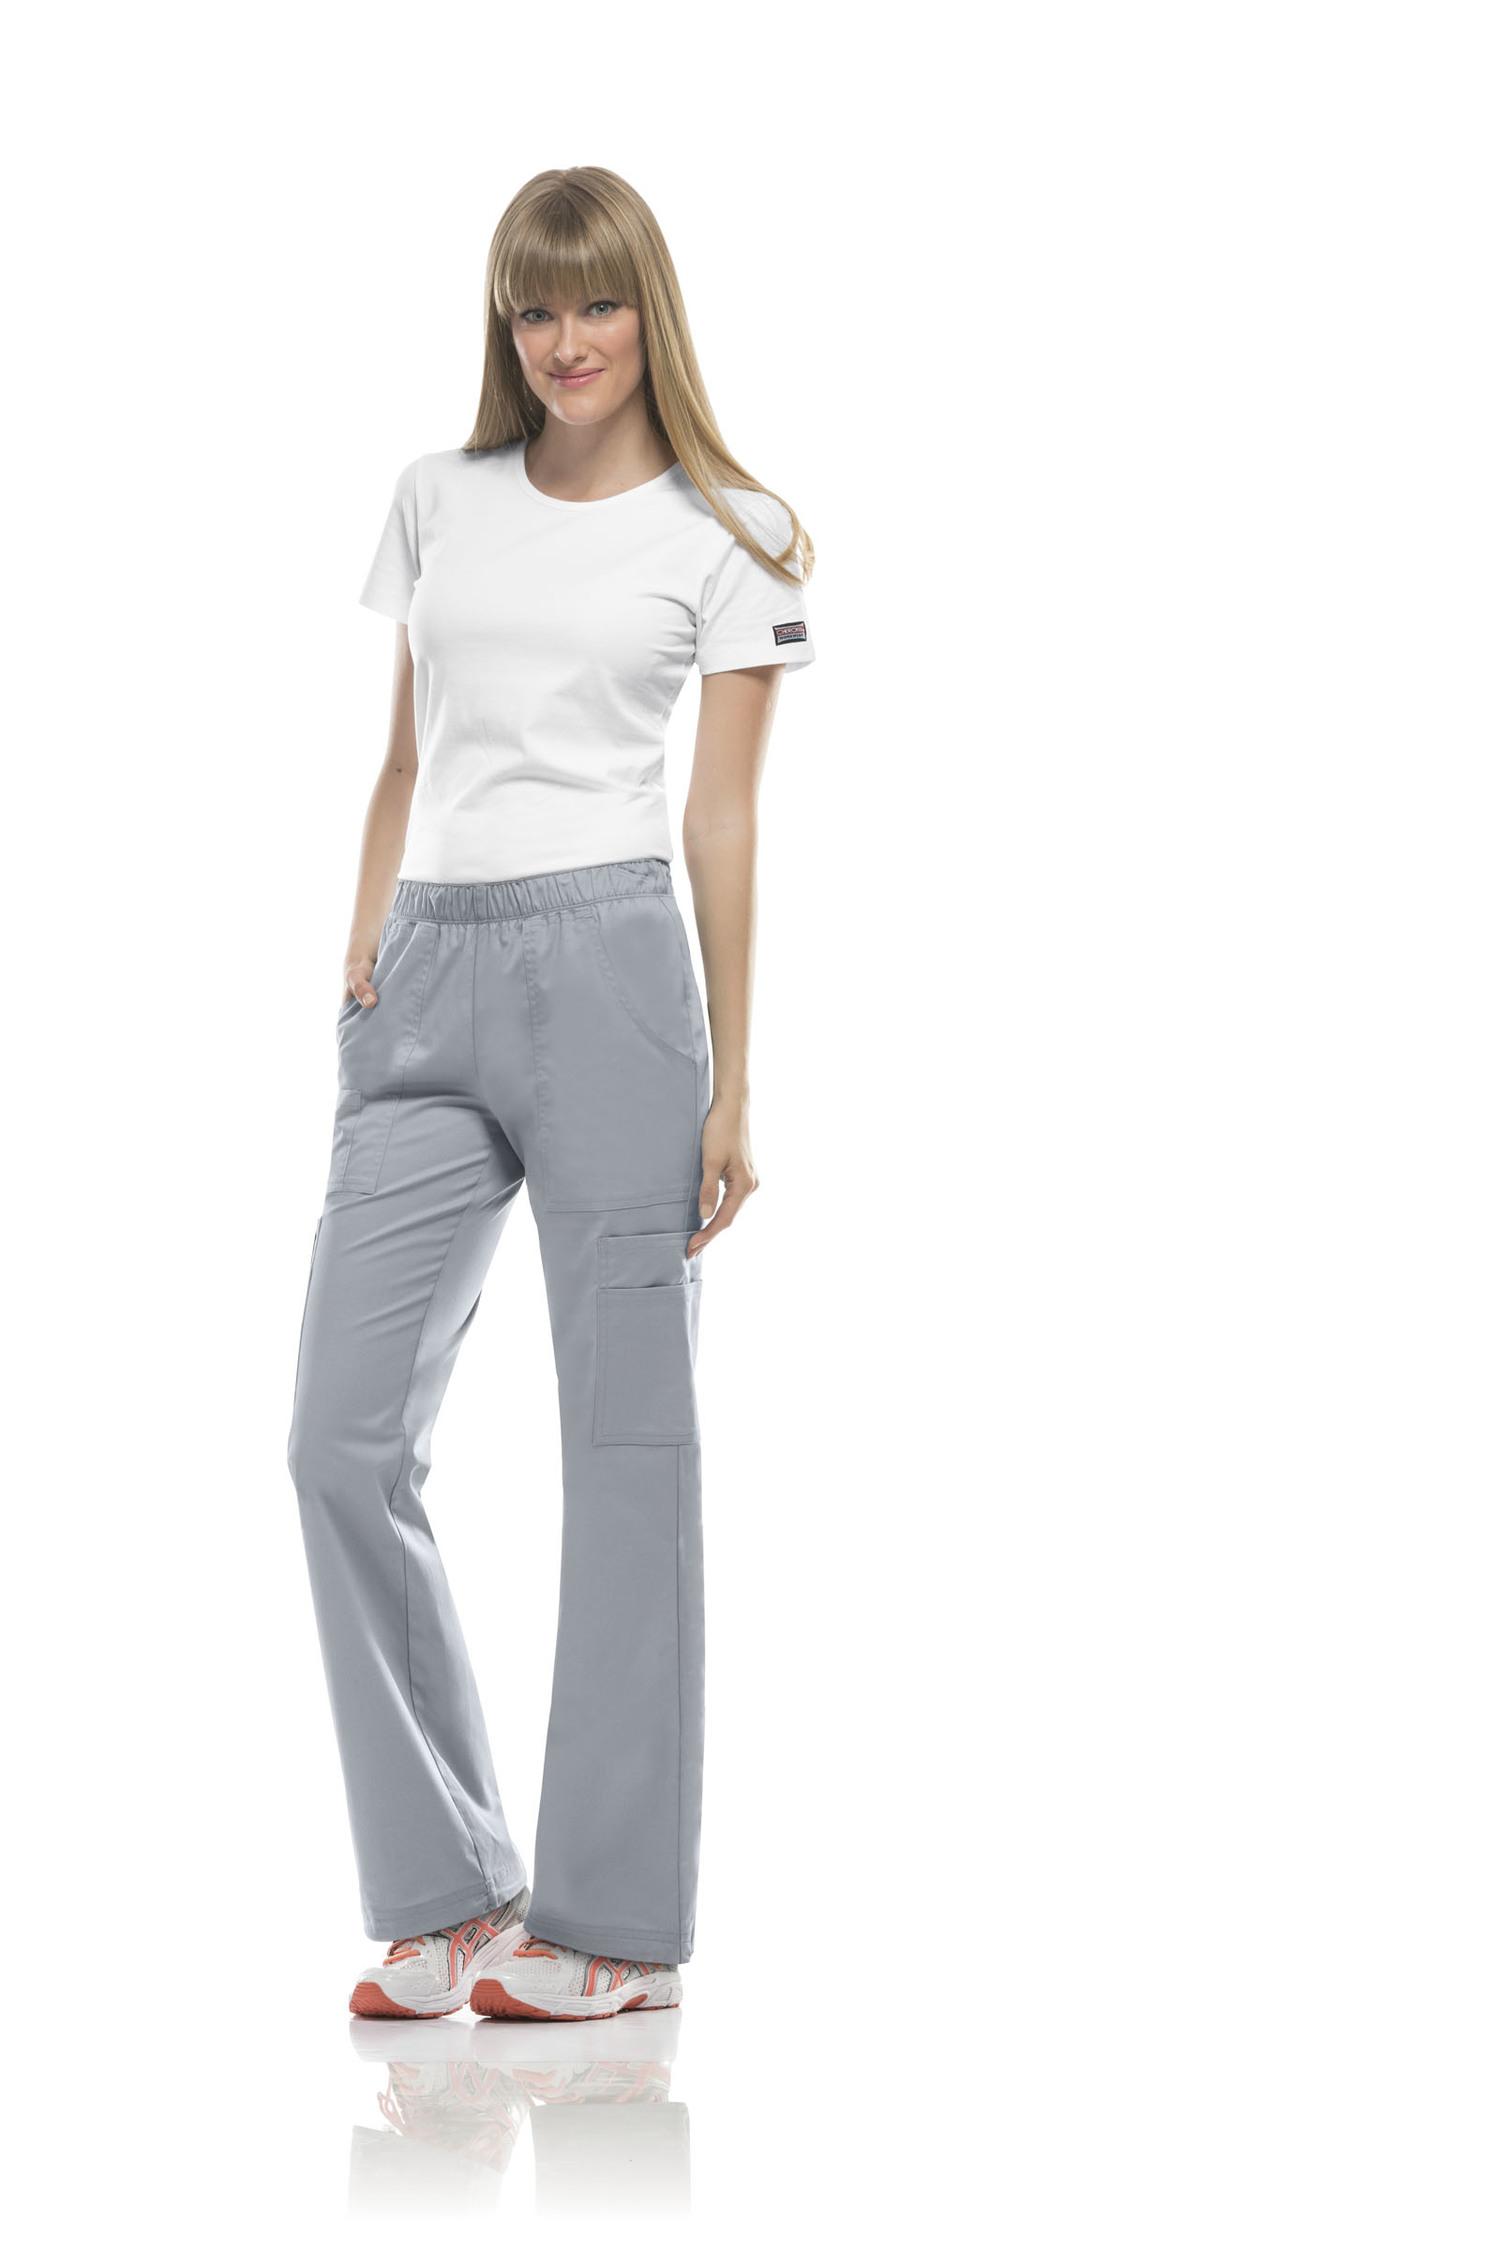 880e70f59e3 Cherokee 4005 Workwear Core Stretch Women's Soft Elastic Scrub Pants Review  — ScrubStyle